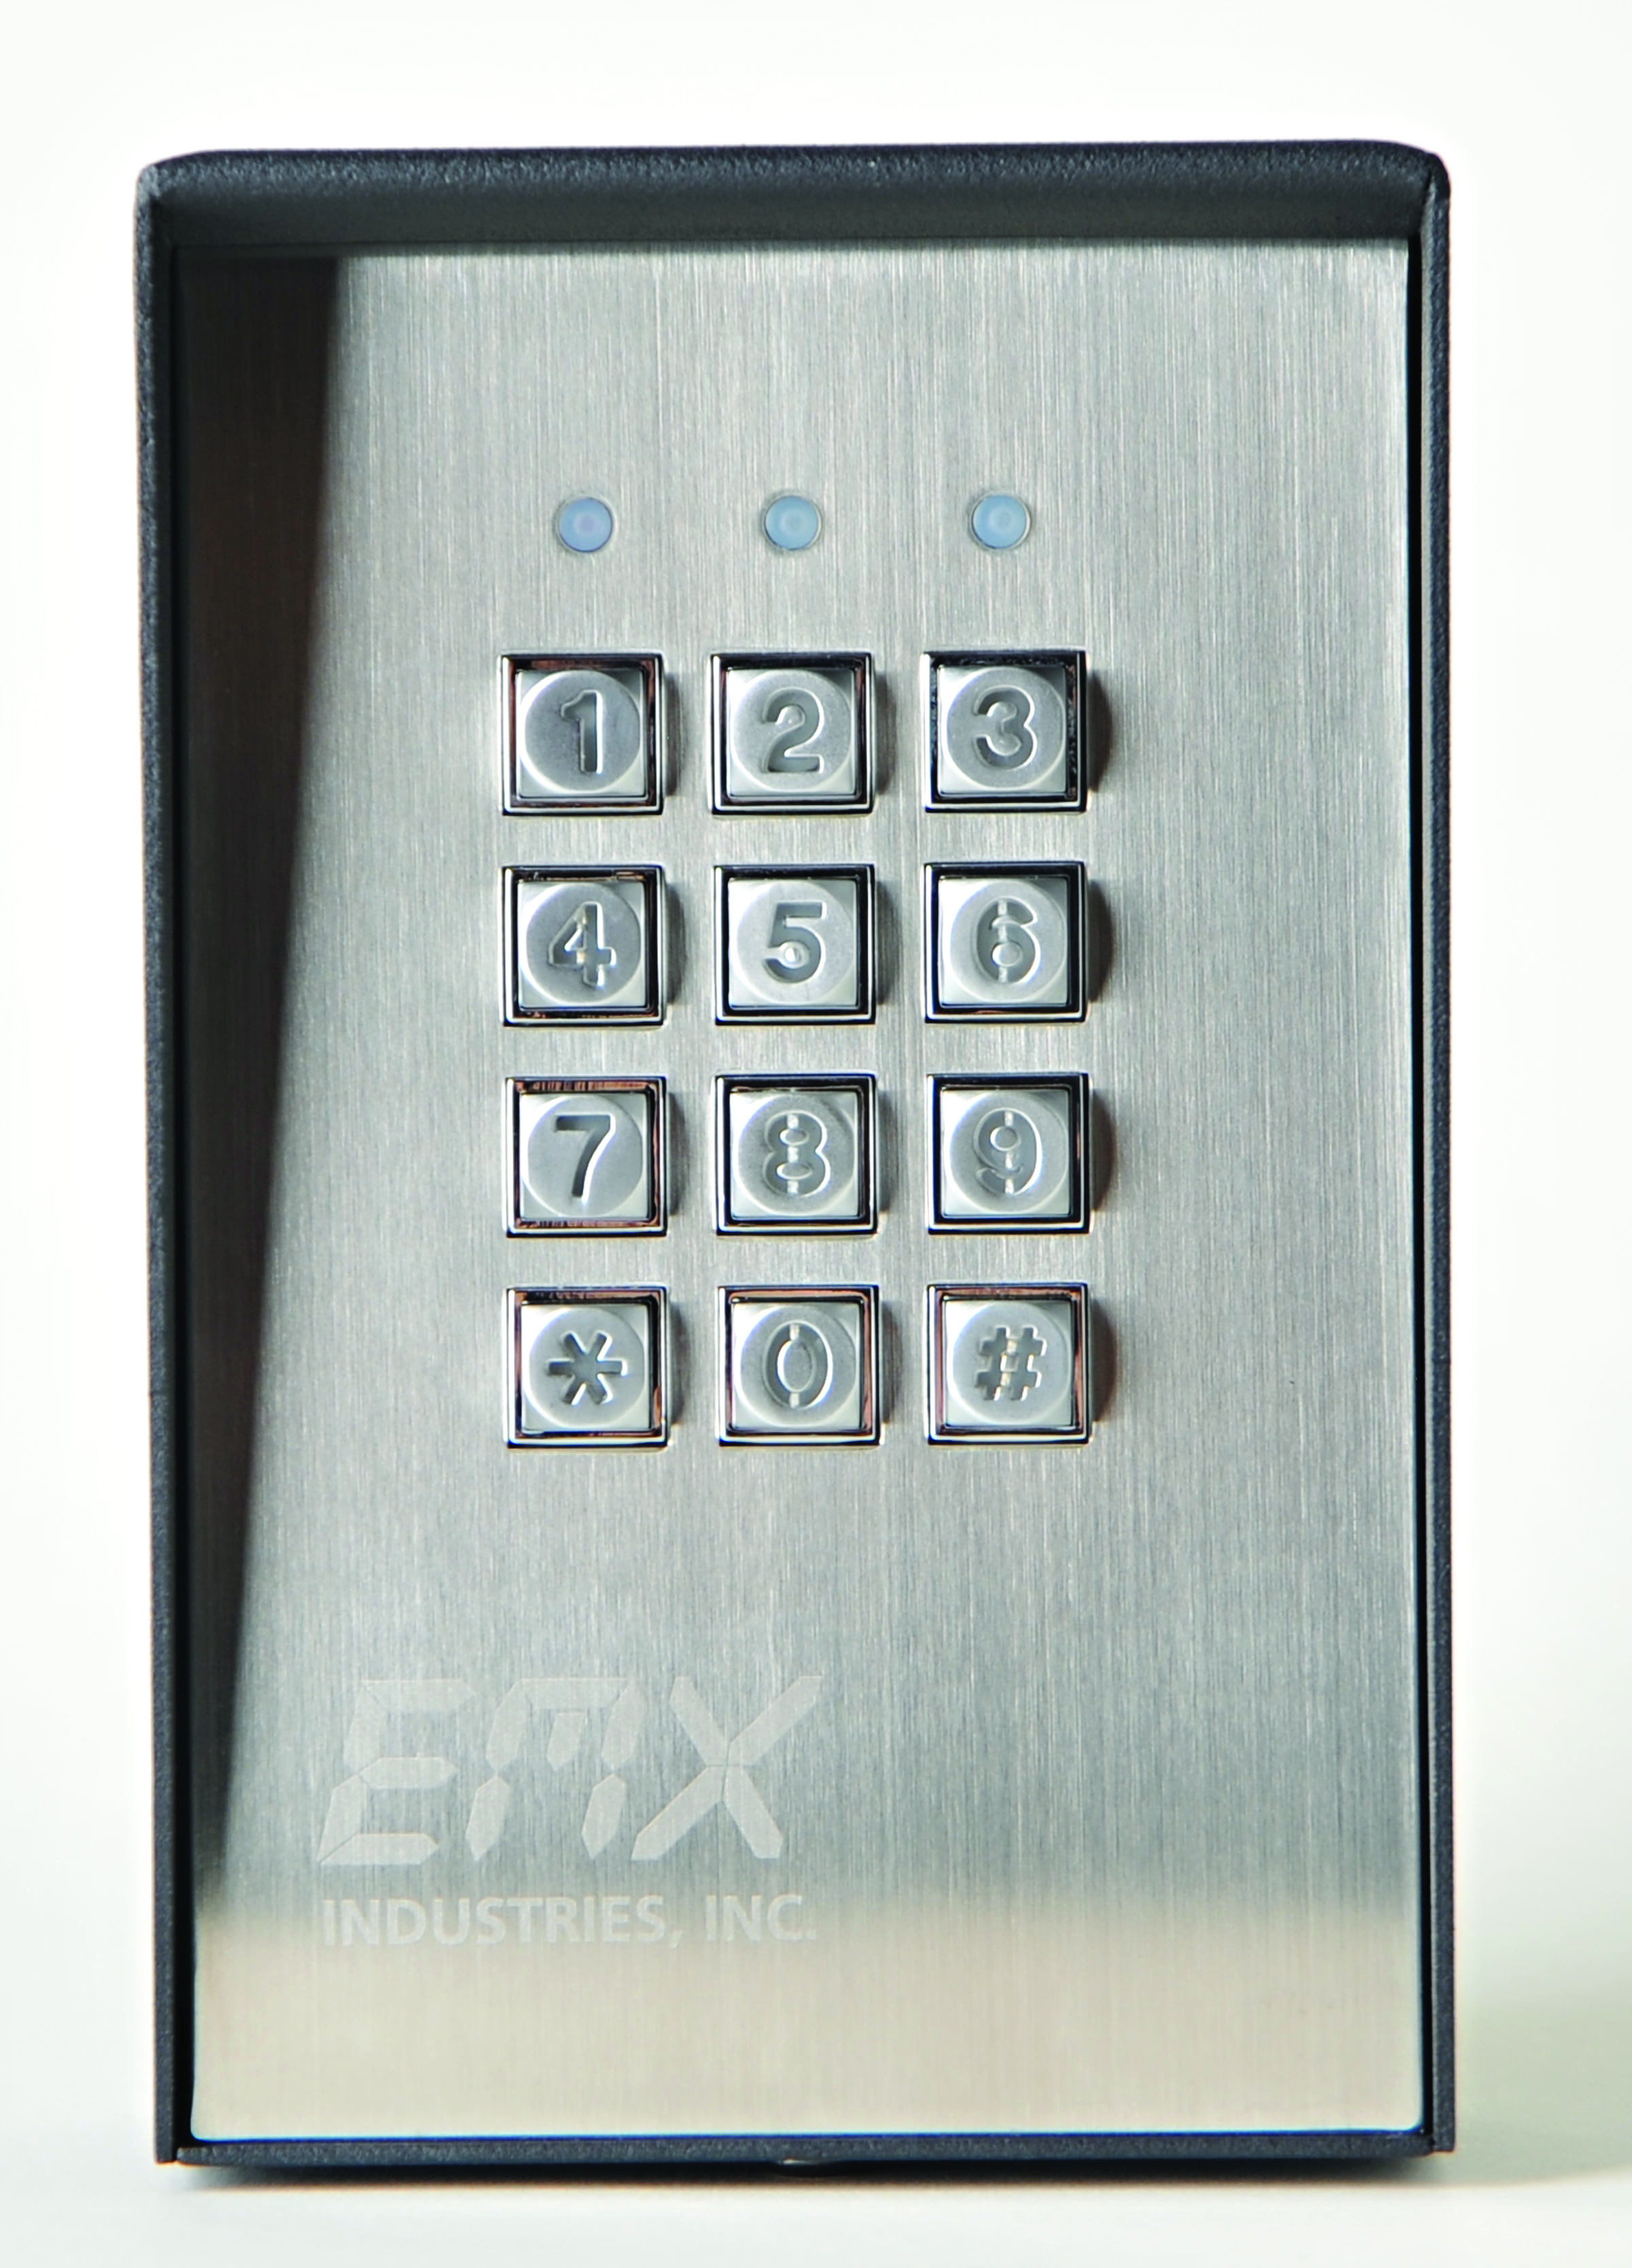 KPX-100 Industrial Keypad